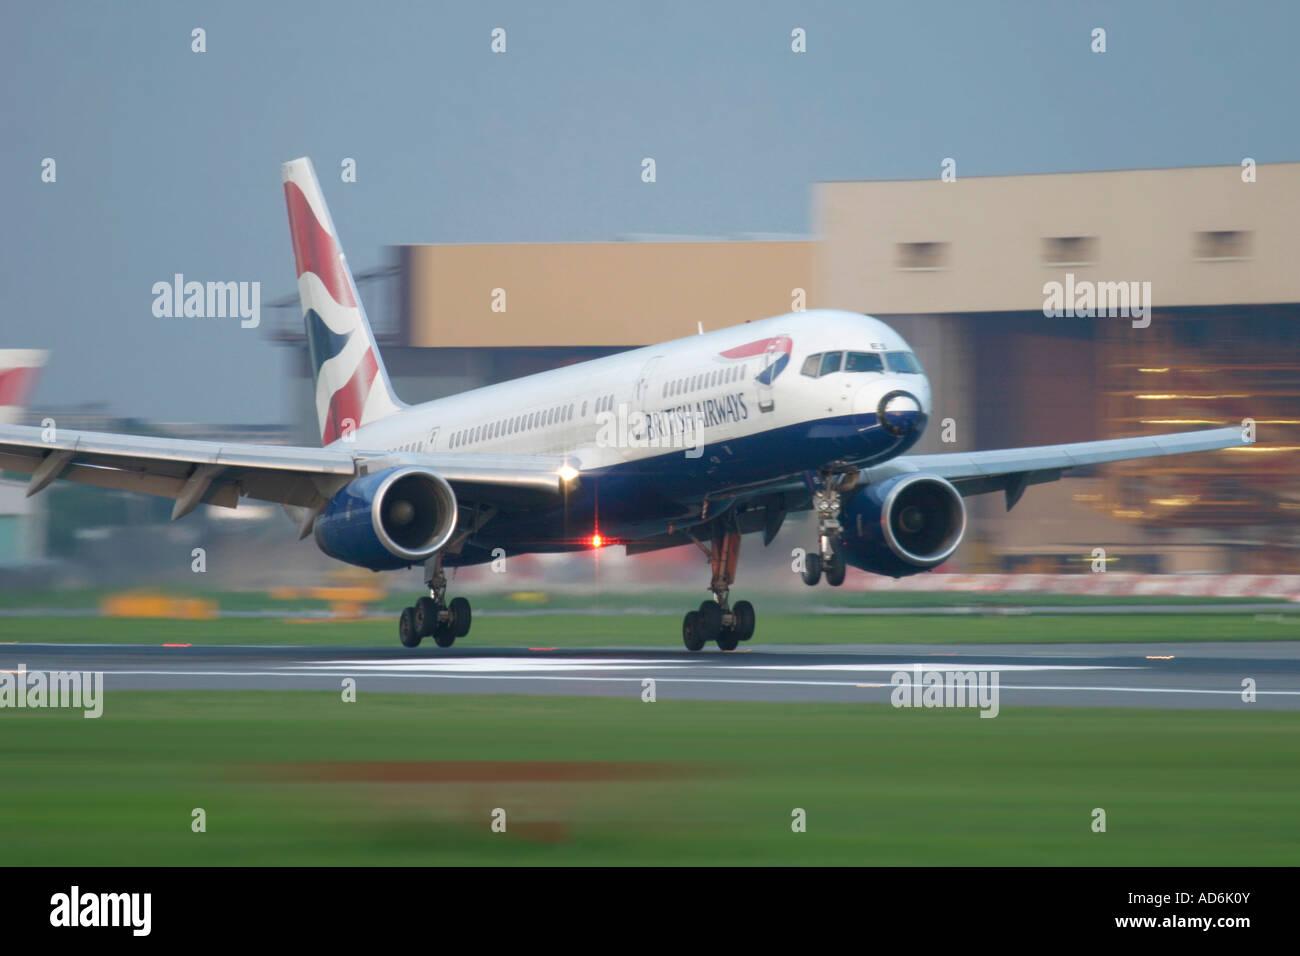 British Airways Boeing 757 touching down at London Heathrow Airport England UK - Stock Image